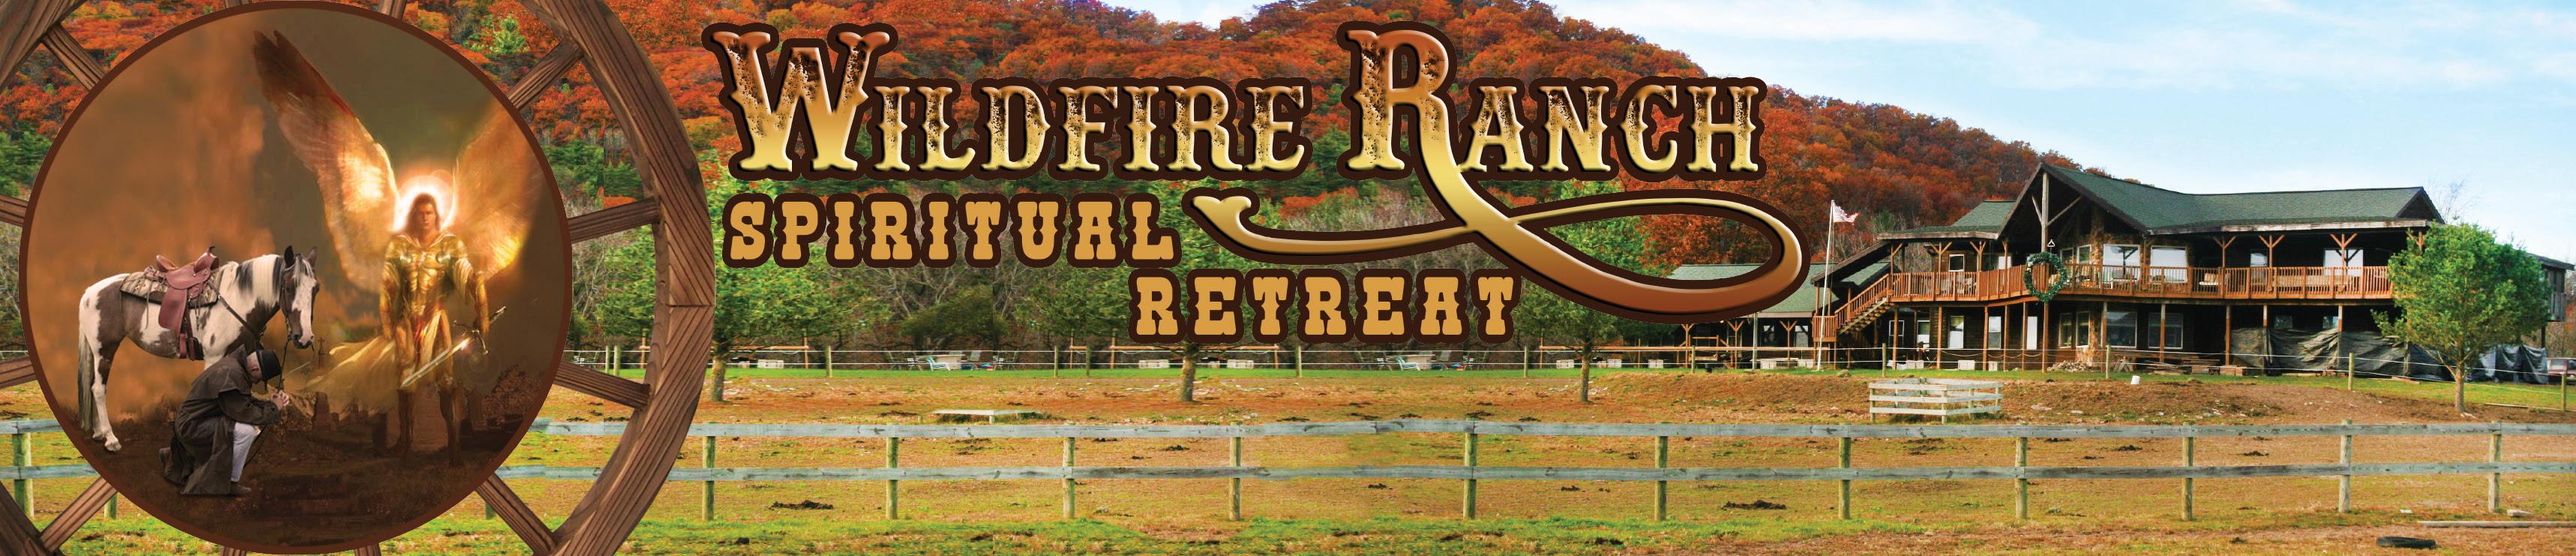 Wildfire Ranch - A Spriritual Retreat - Spring Mills, PA